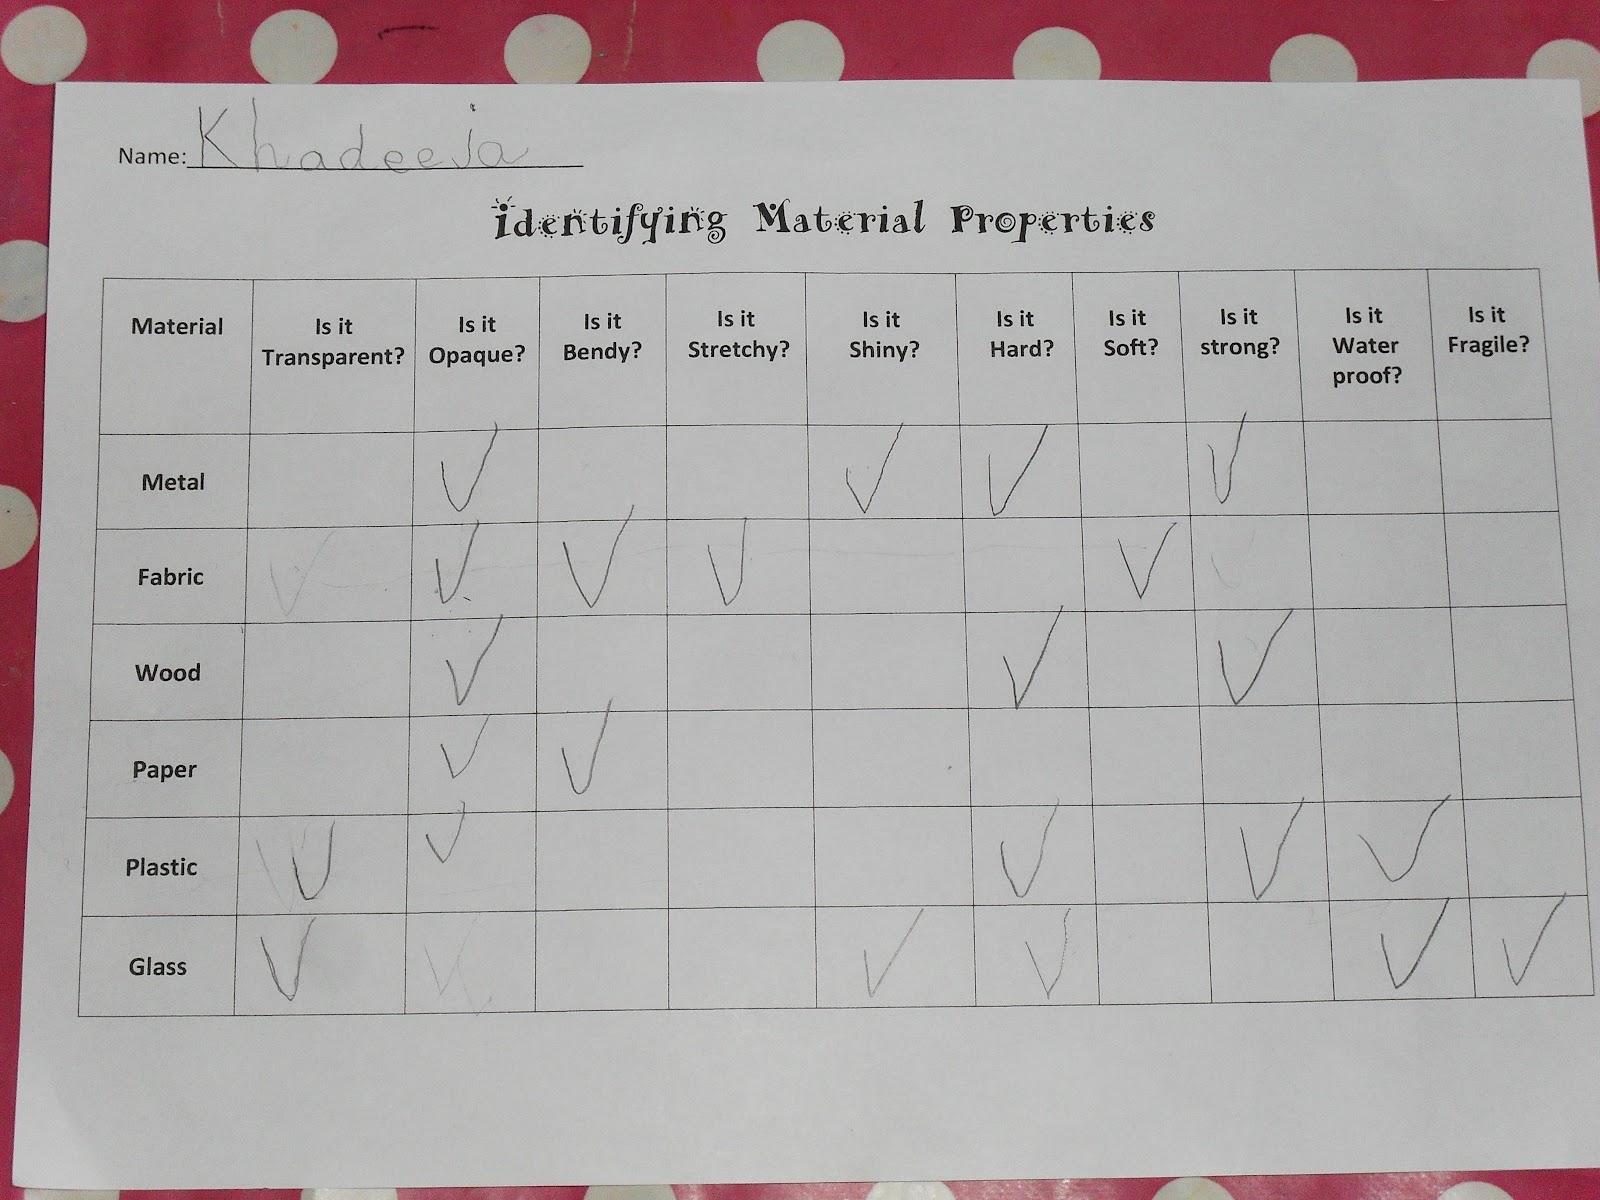 A Muslim Homeschool Identifying Material Properties